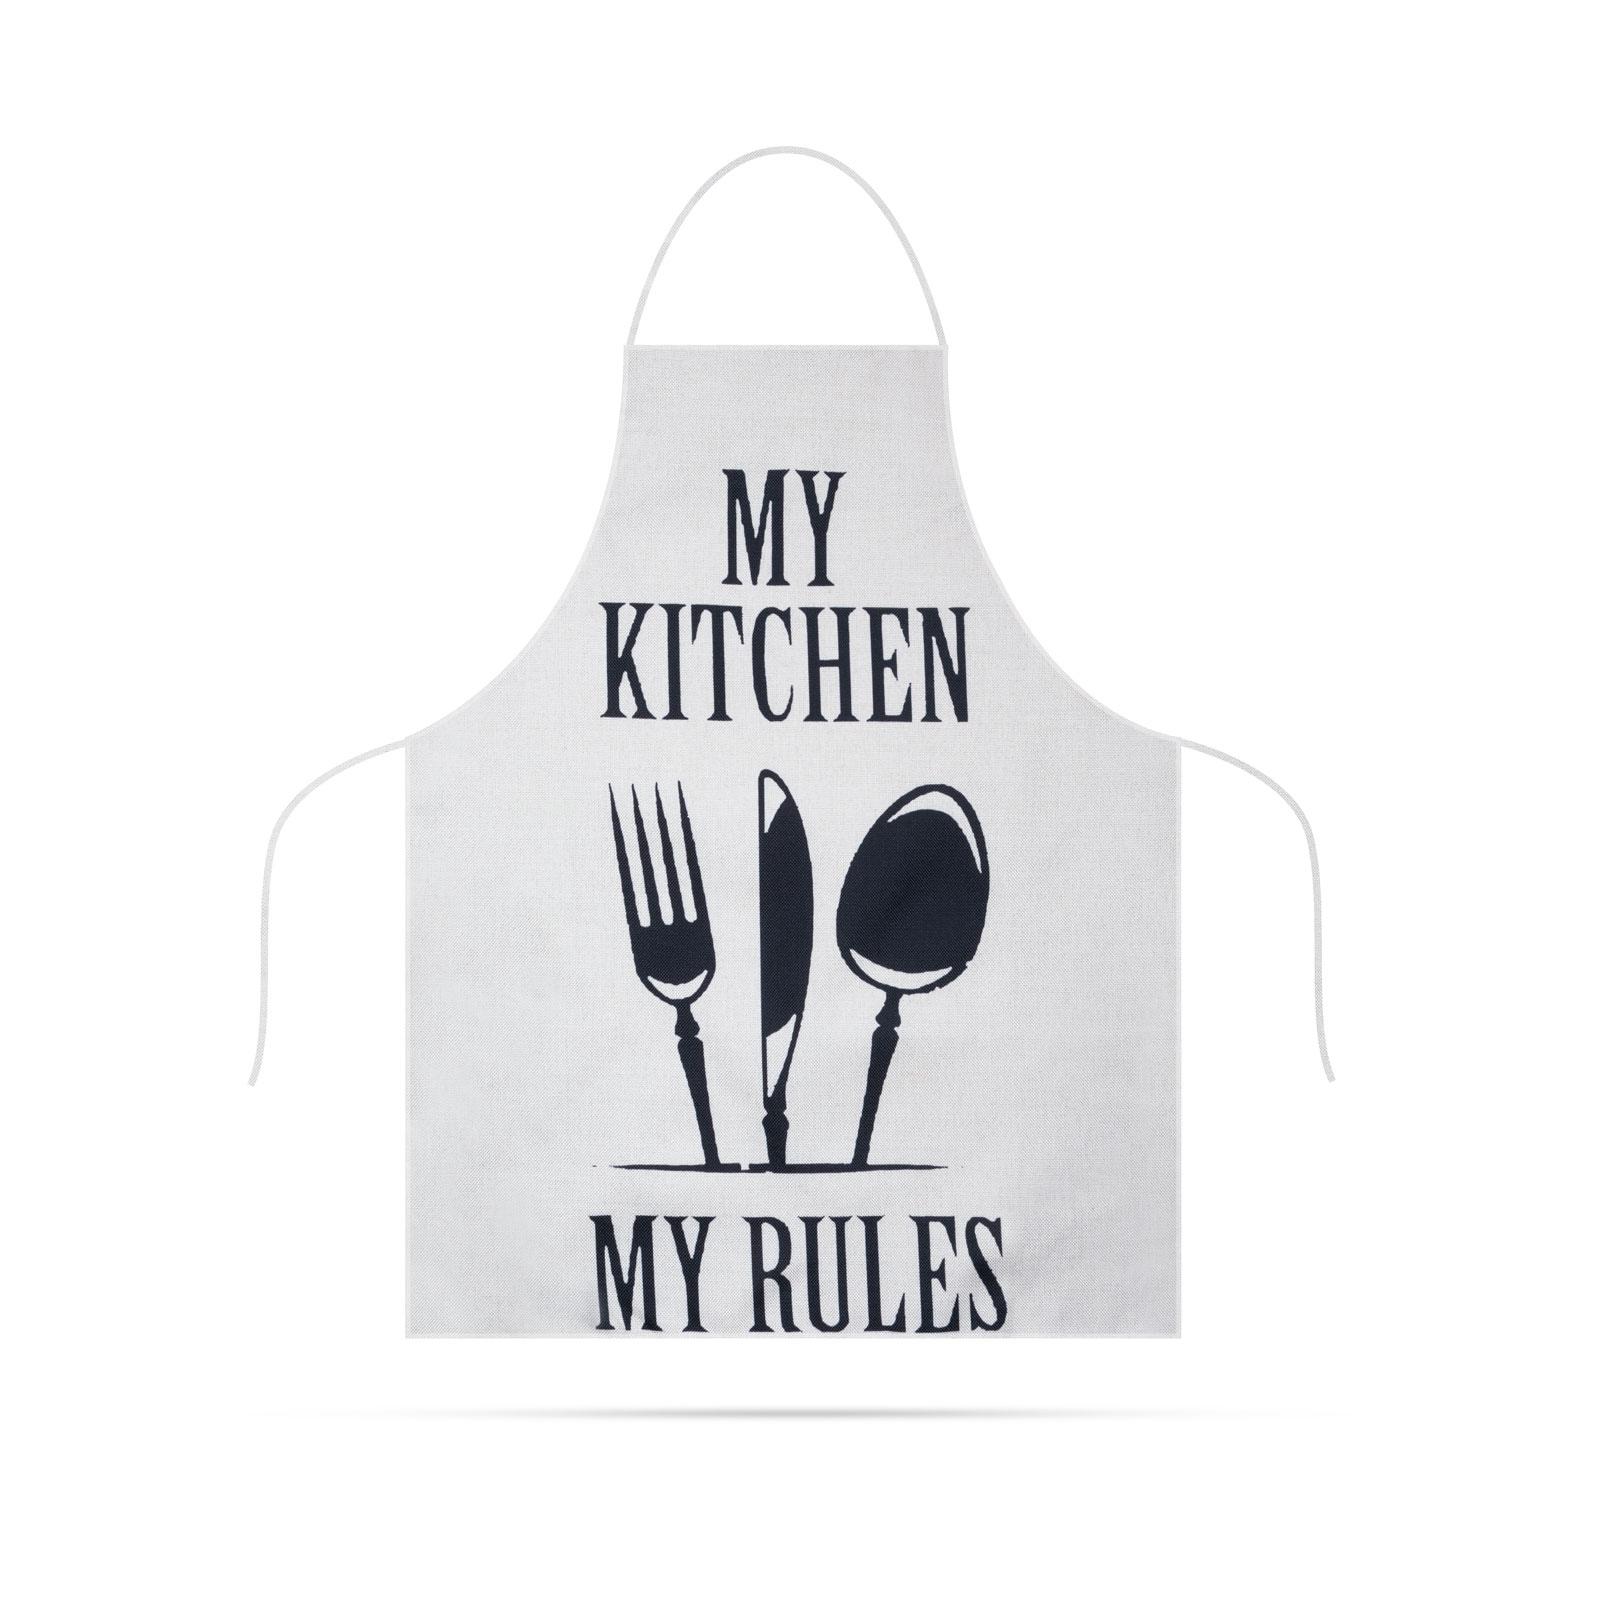 Șorț de bucătărie - 68 x 52 cm - My kitchen, My rules! (alb)